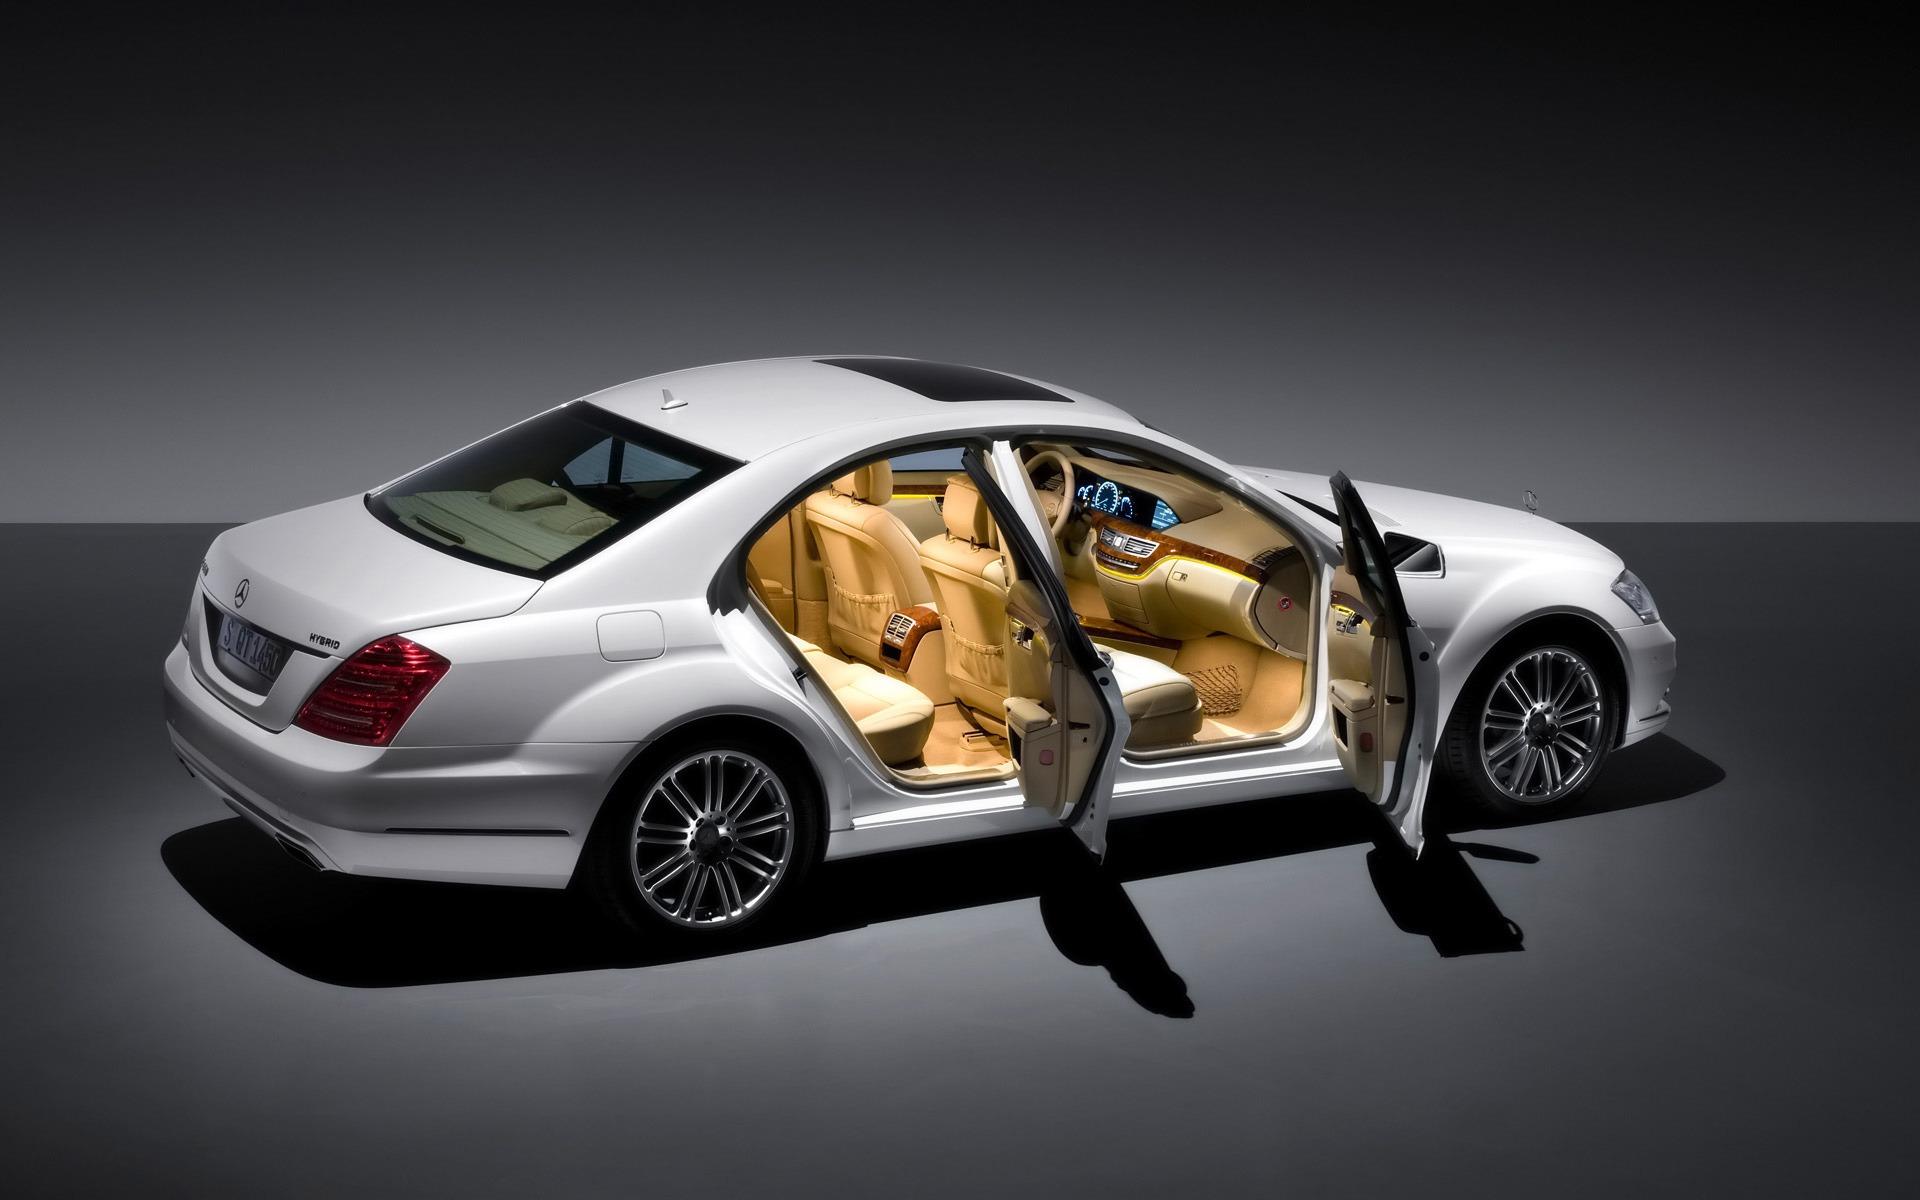 Mercedes Benz S400 Wallpaper Mercedes Cars Wallpapers In Jpg Format